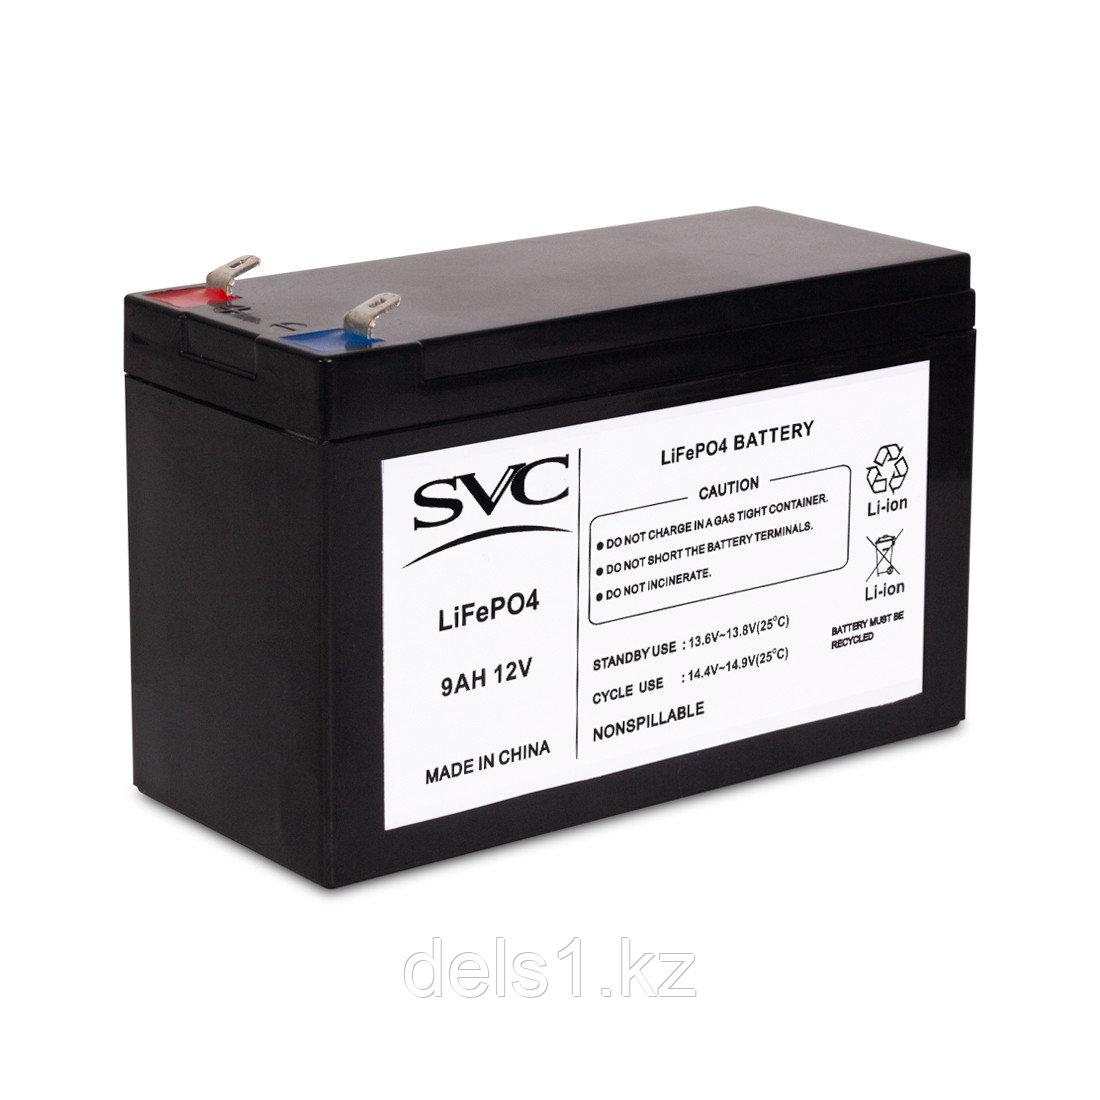 Батарея, SVC, 12V 9Ah LiFePO4 , Размер в мм.: 95*151*65